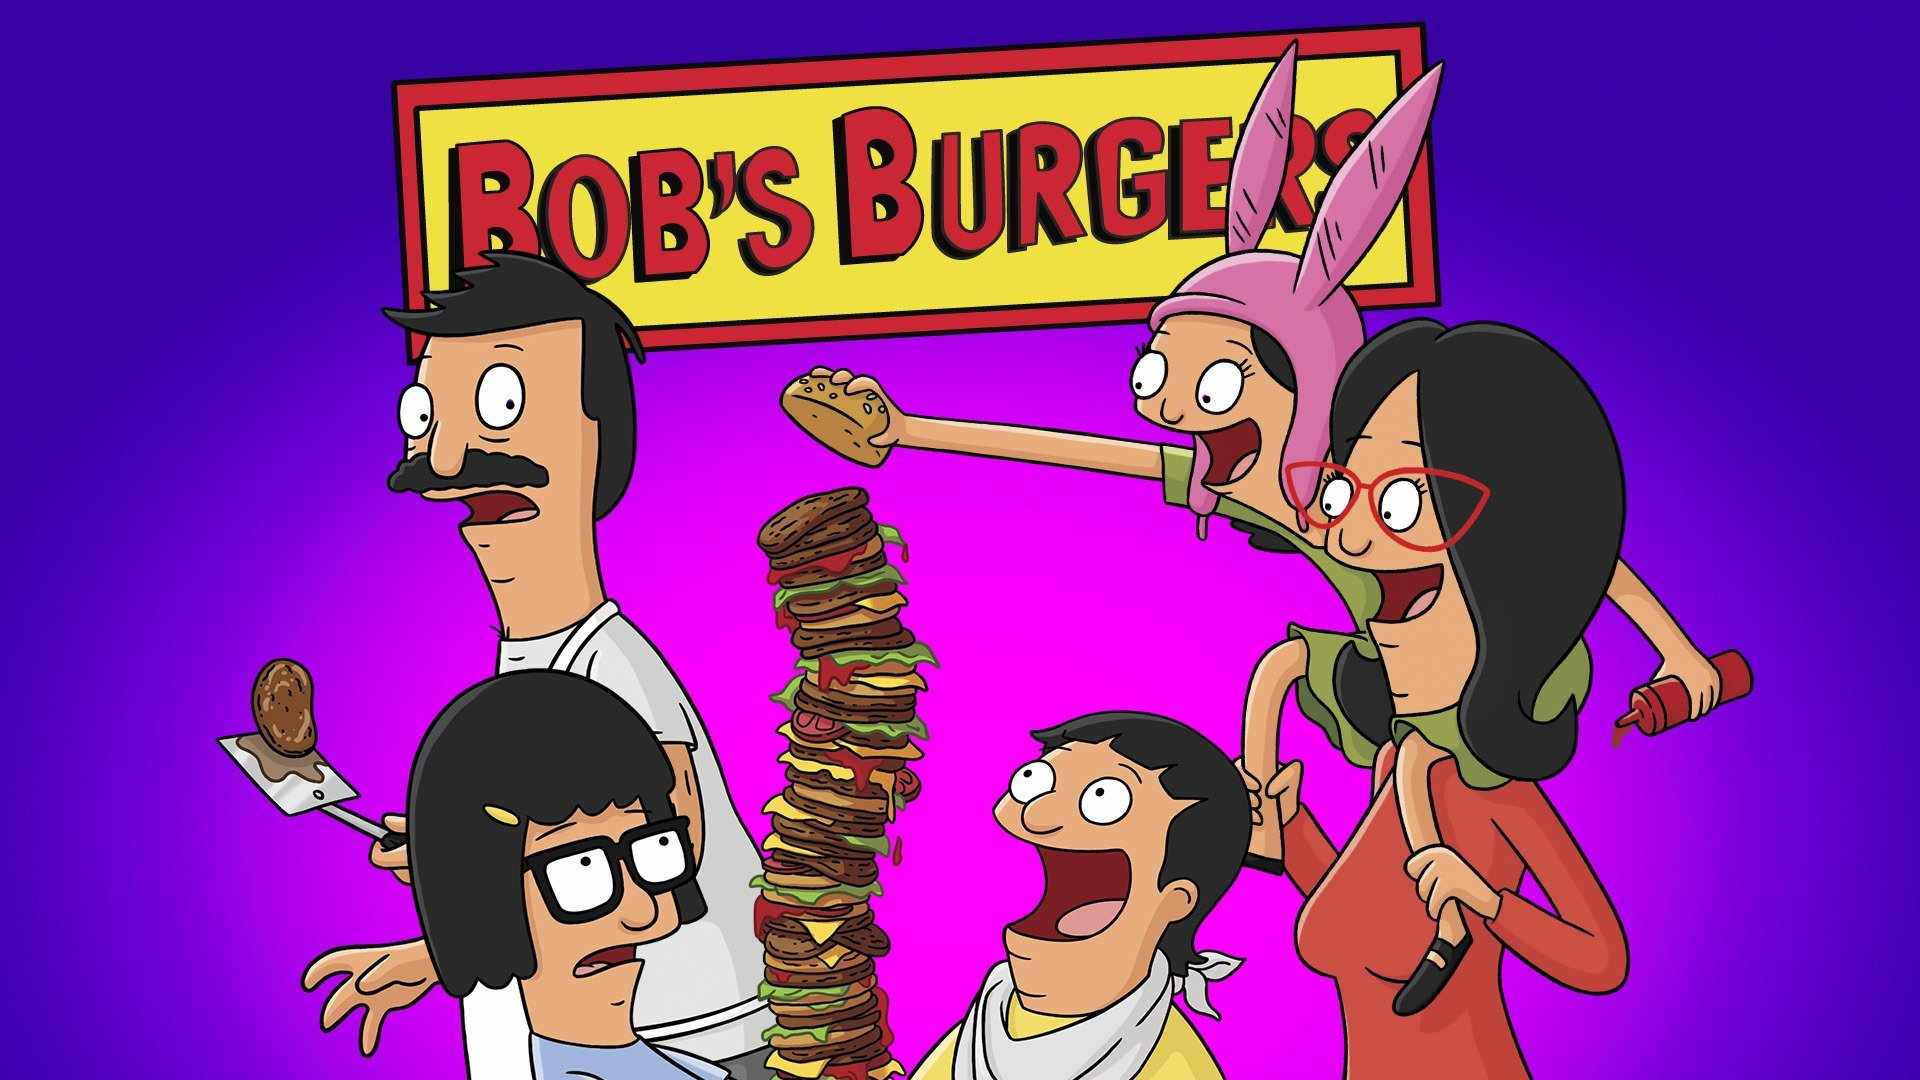 Bob's Burgers Wallpapers and Details - Mega Themes